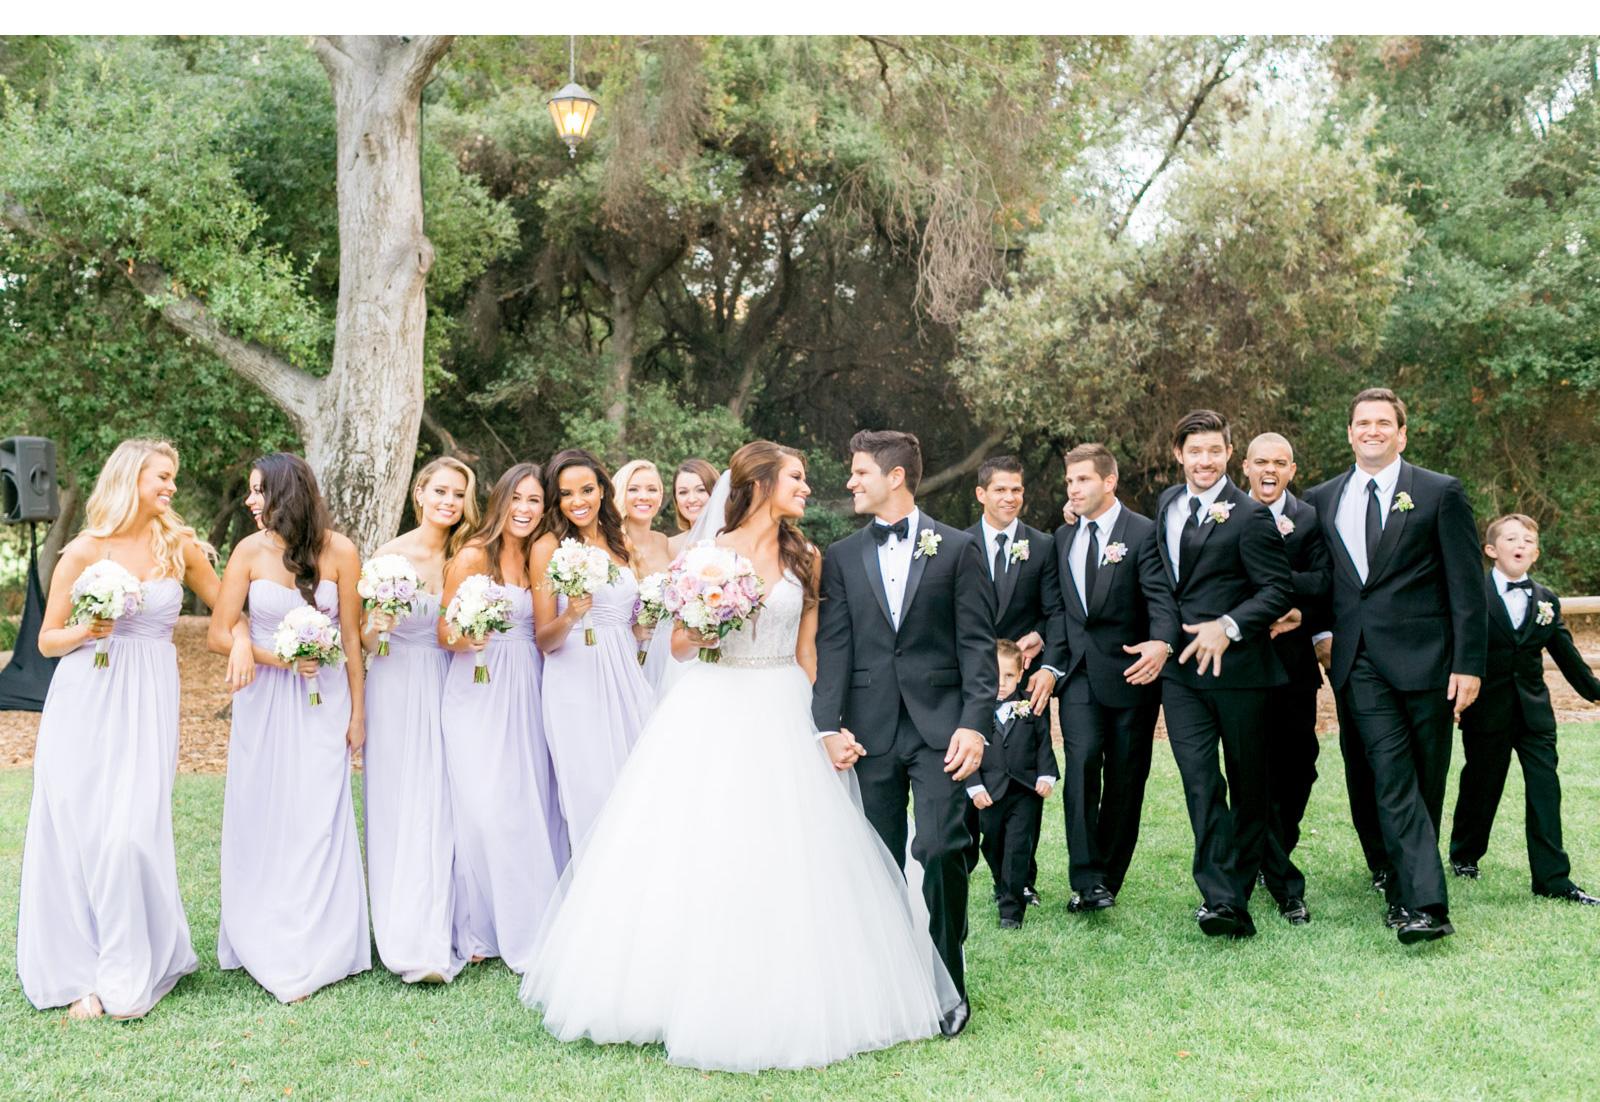 Miss-USA-Nia-Sanchez-Temecula-Wedding-Natalie-Schutt-Photography_05.jpg